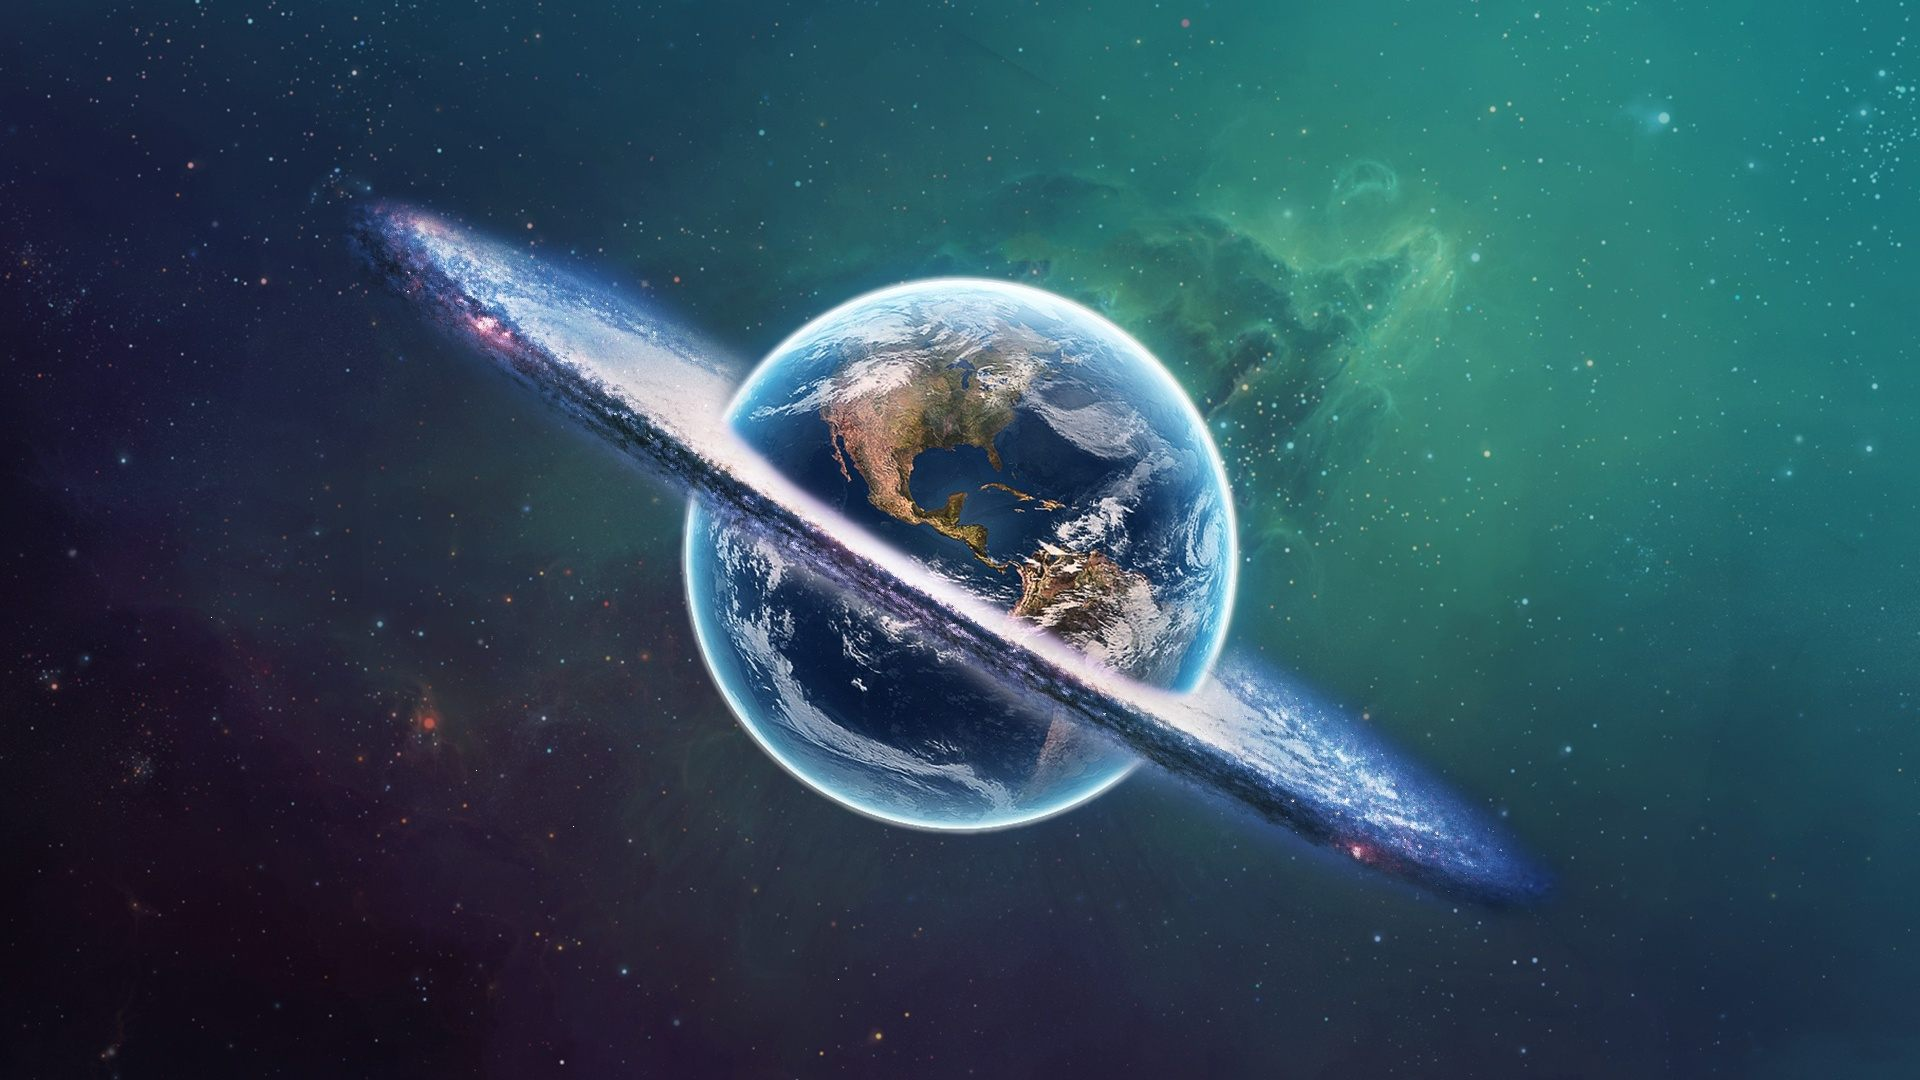 Earth Wallpaper Sf Wallpaper